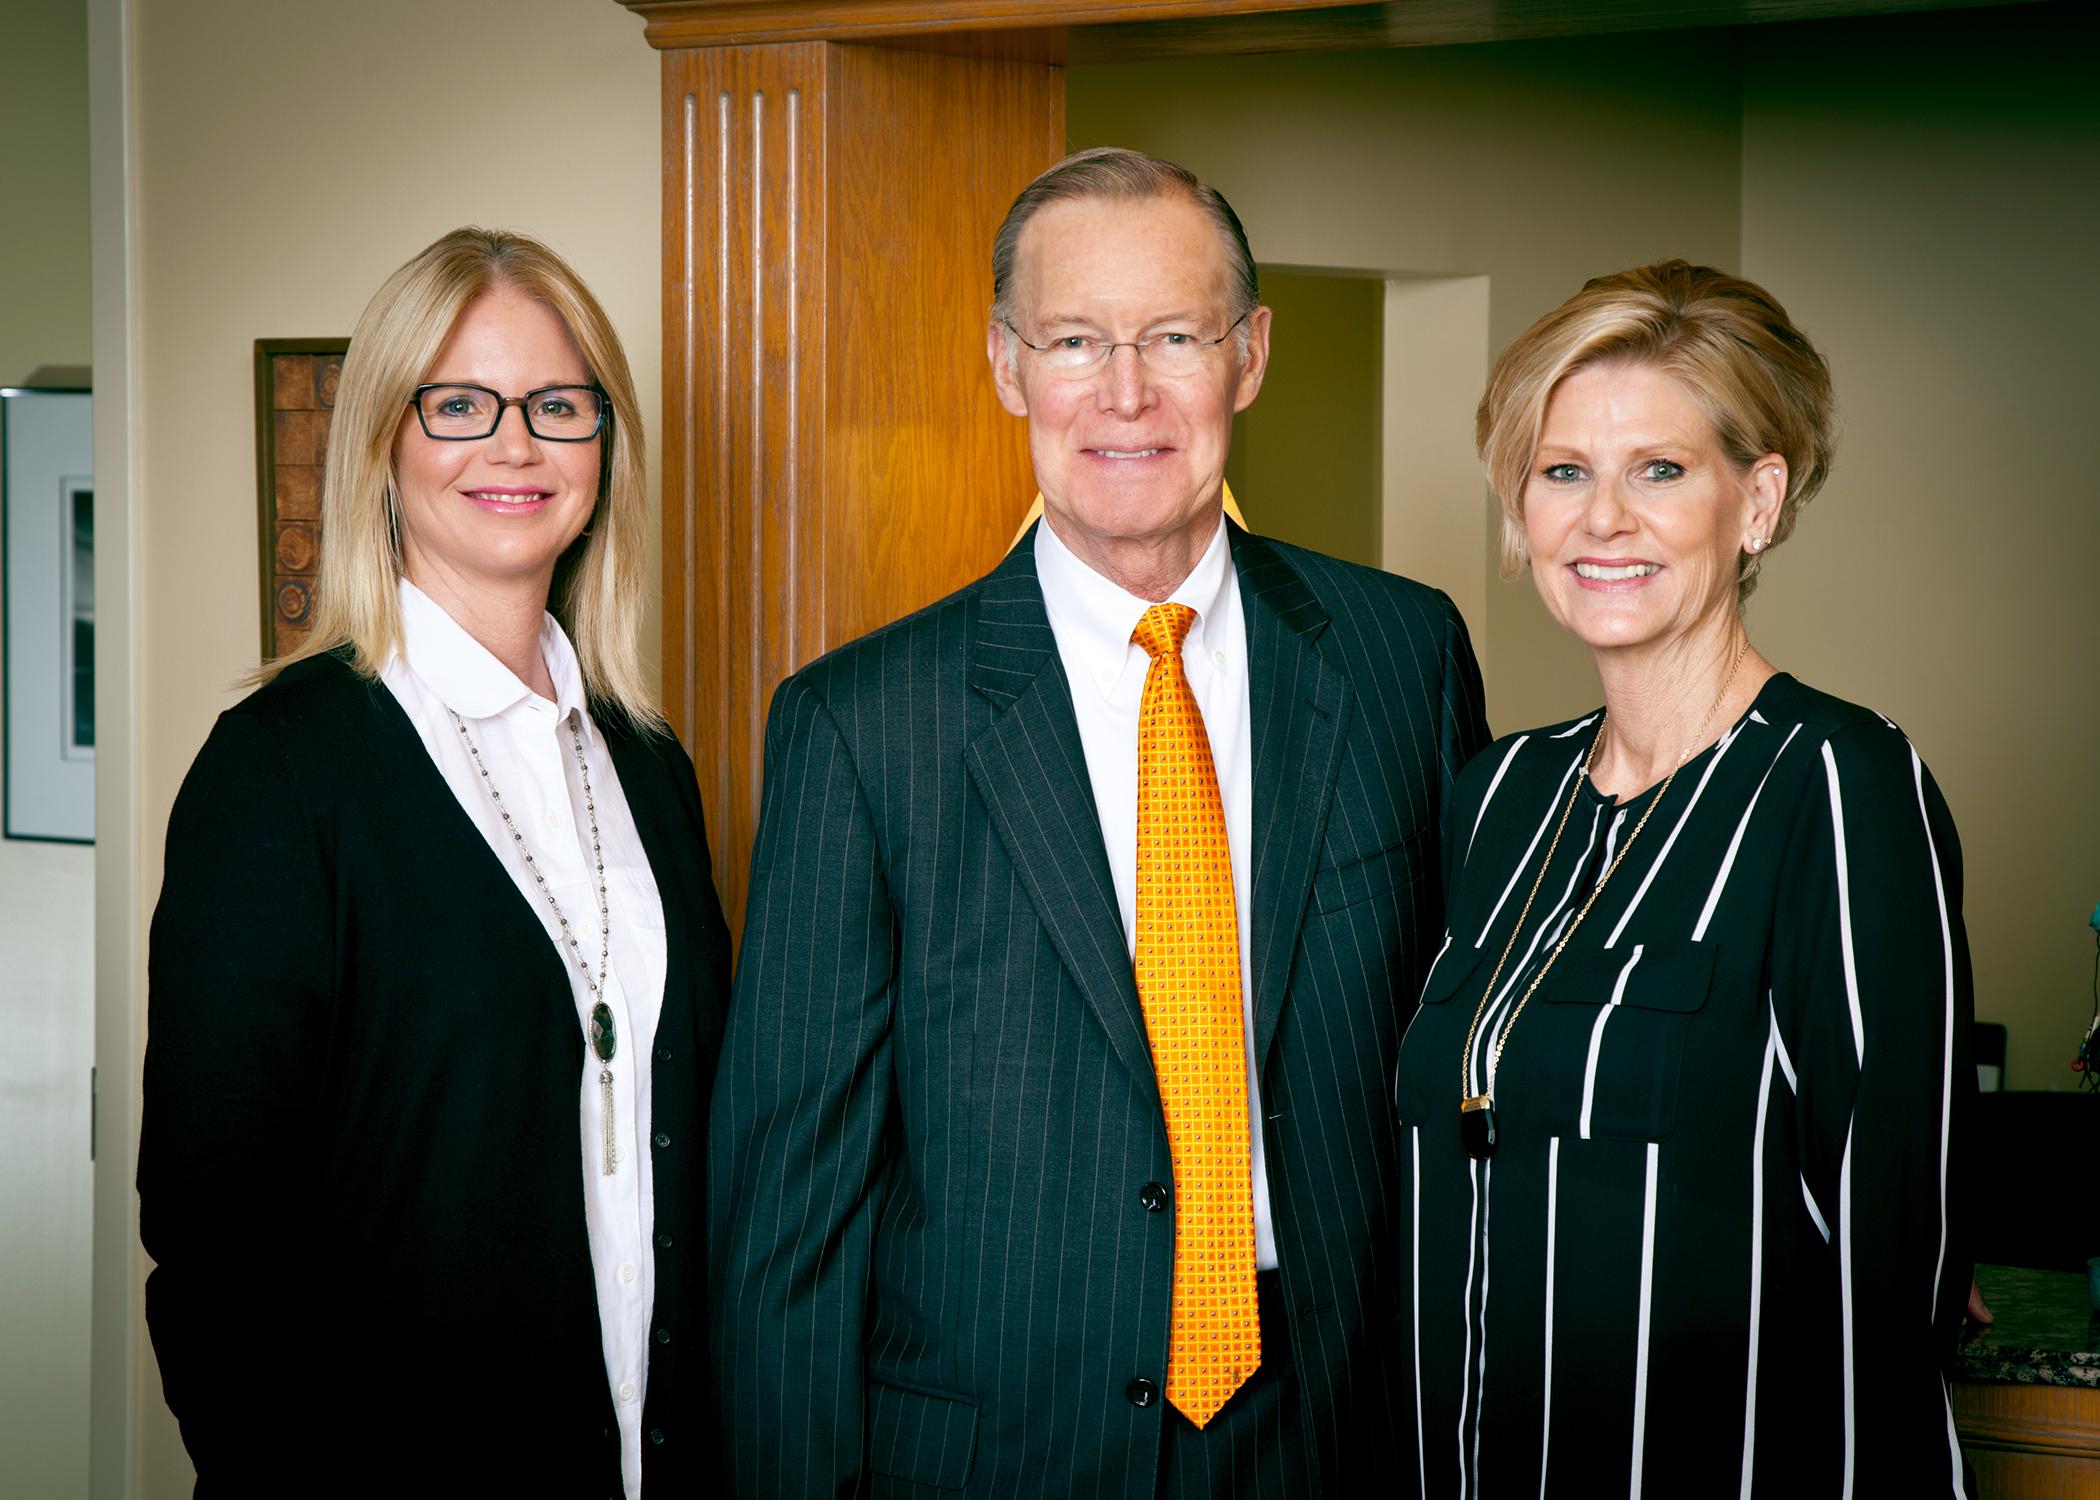 Dr Gary Hill Plastic Surgeon Oklahoma